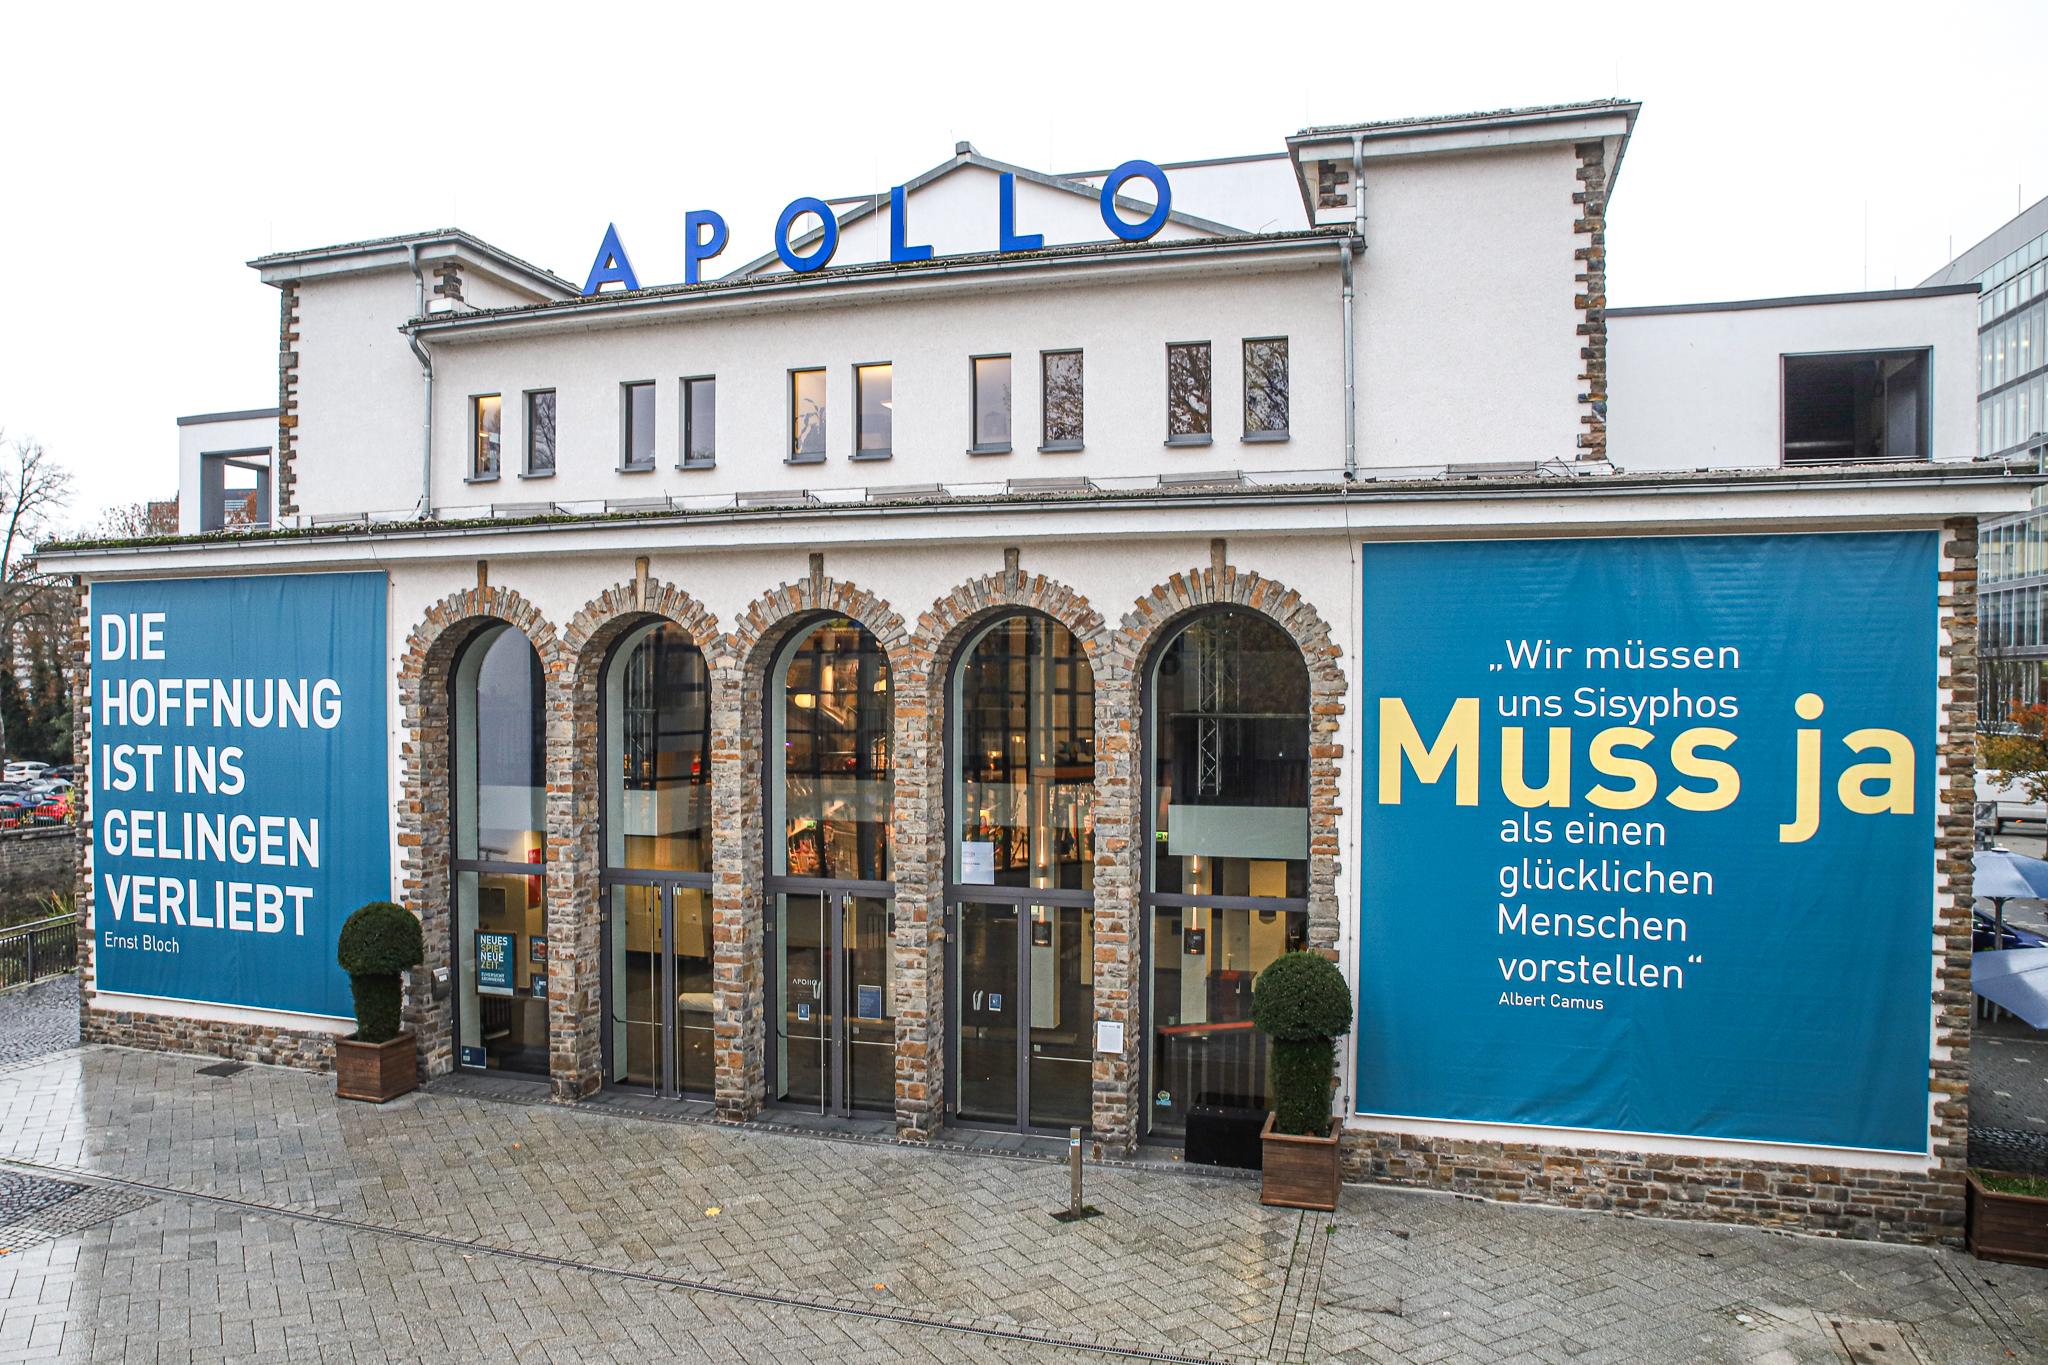 Camus als Ermutigung – an der Apollo-Fassade